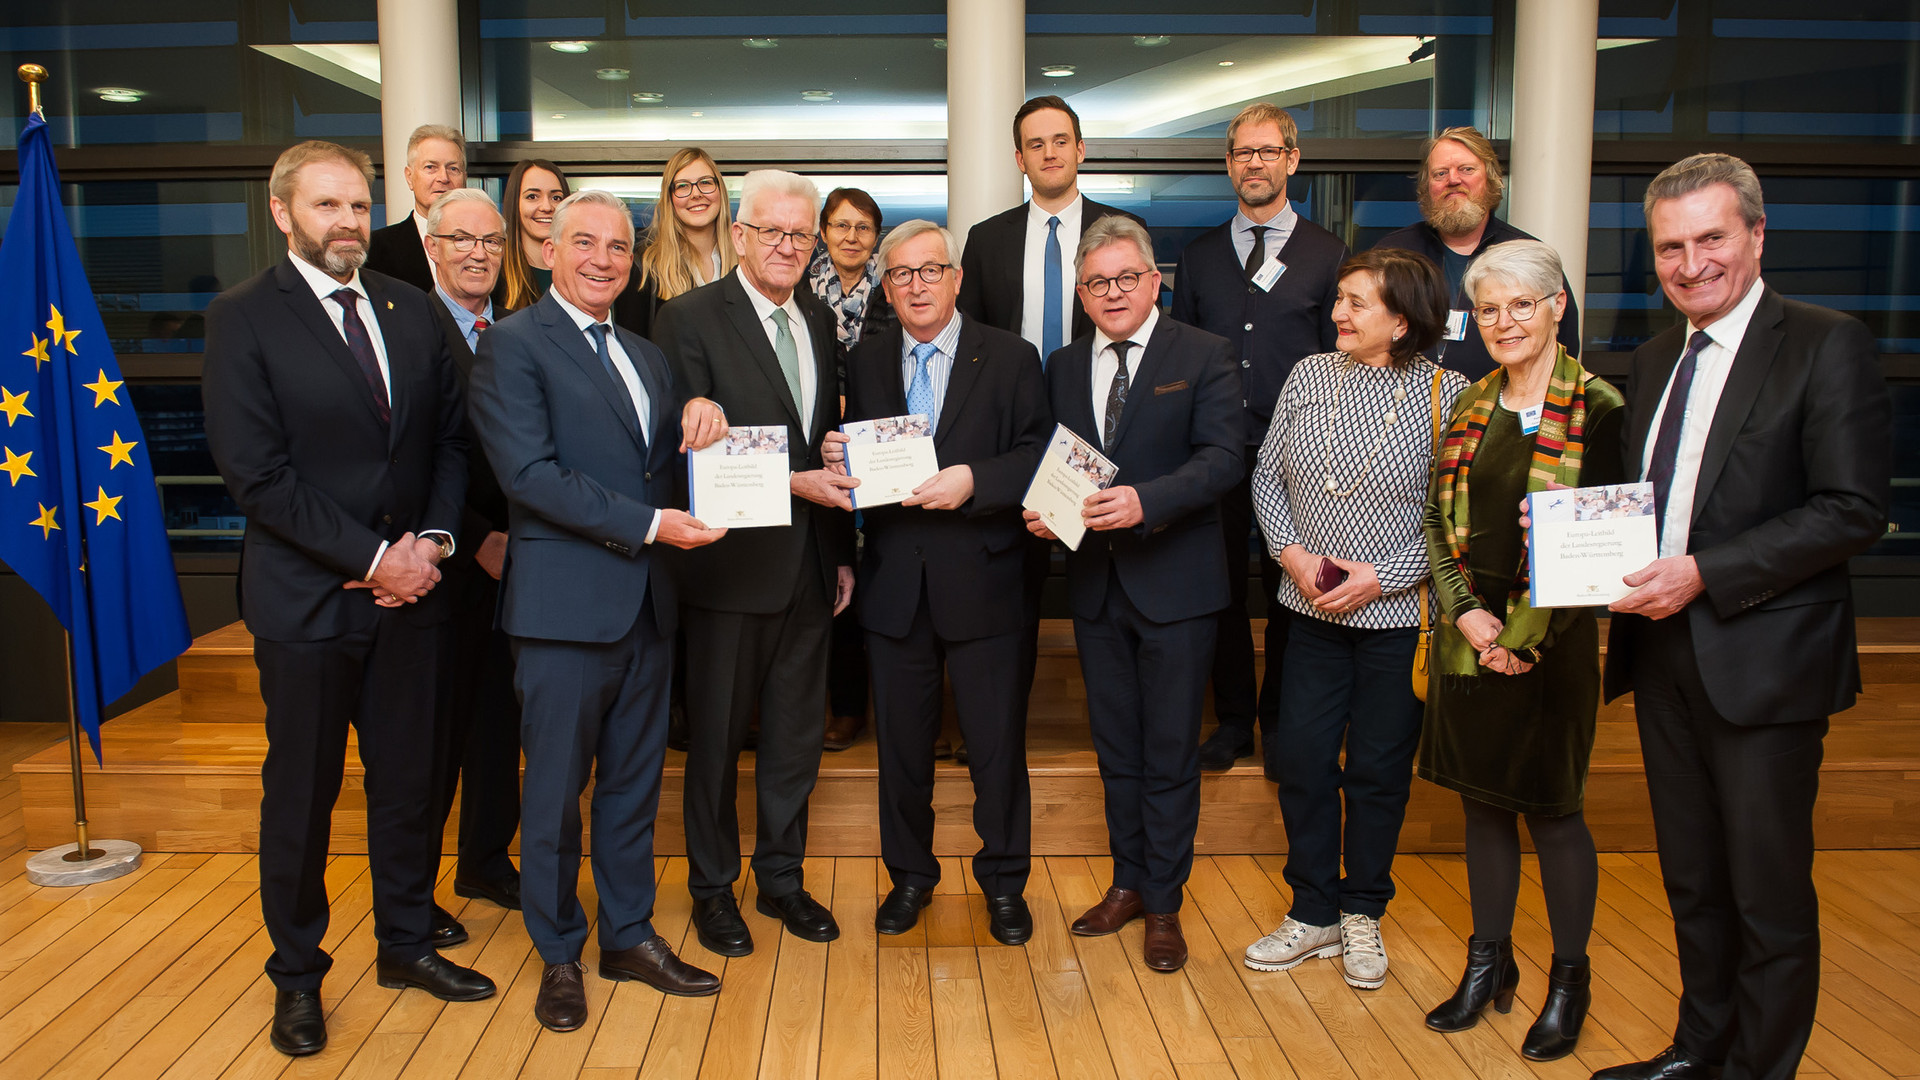 Landesregierung stellt Europa Leitbild vor Baden Württemberg.de